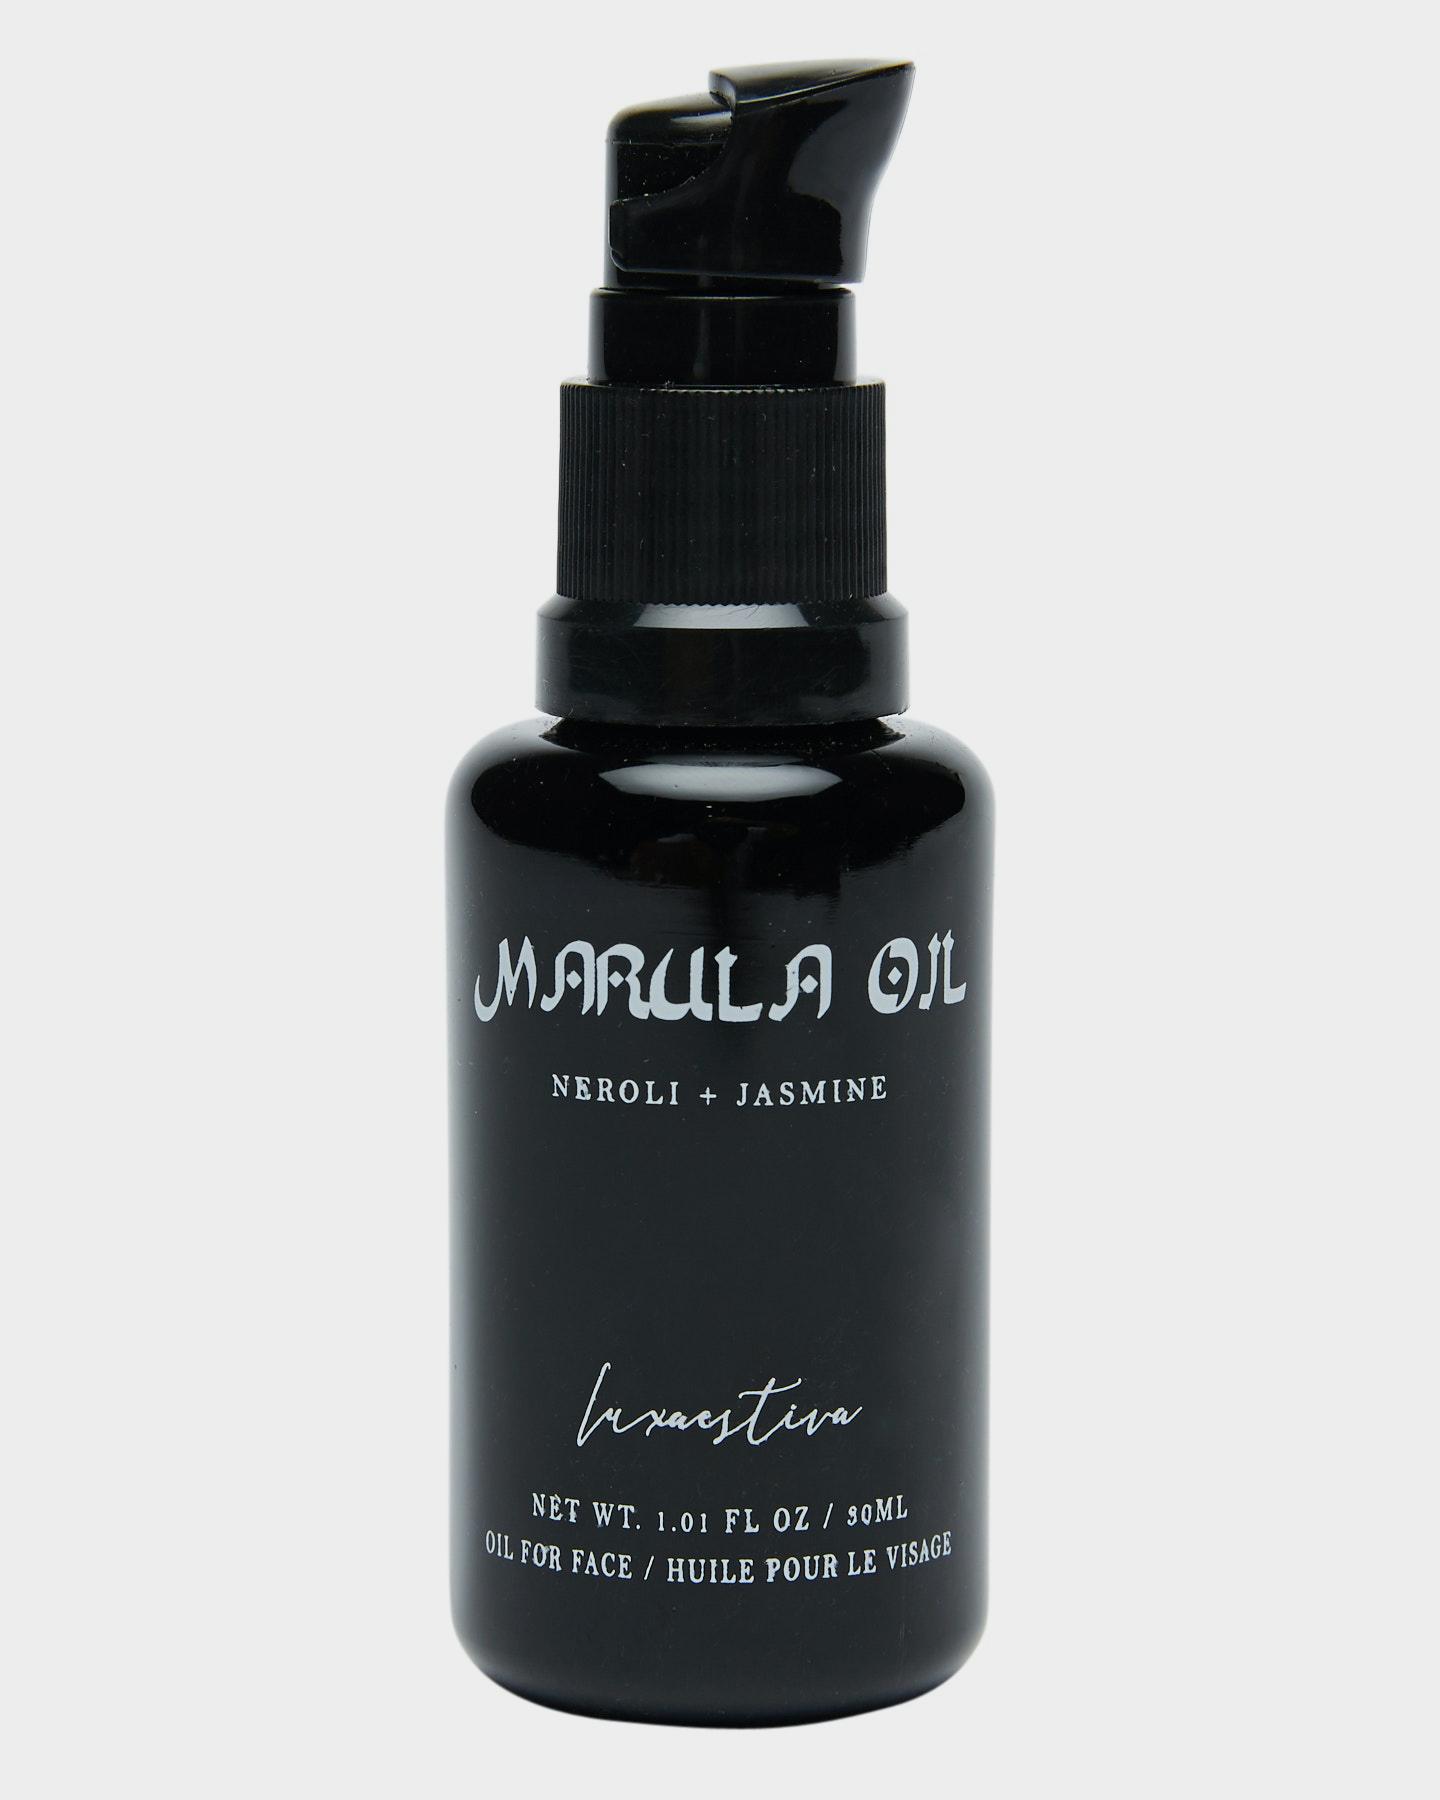 Lux Aestiva Marula Oil With Neroli And Jasmine Sambac Natural Natural